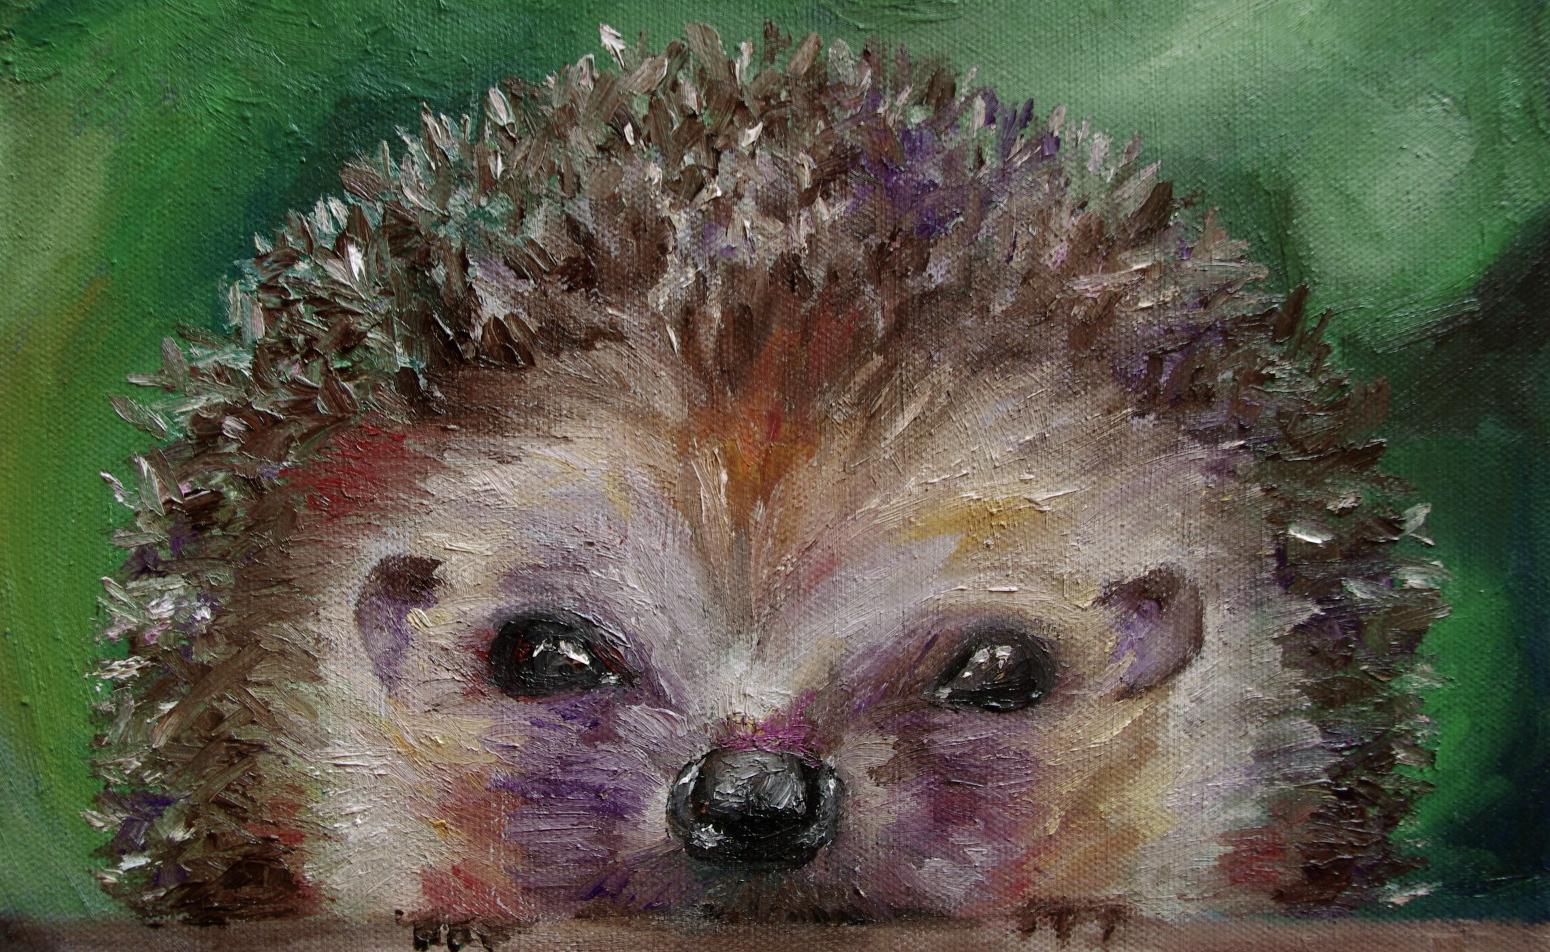 Eyes Of A Hedgehog